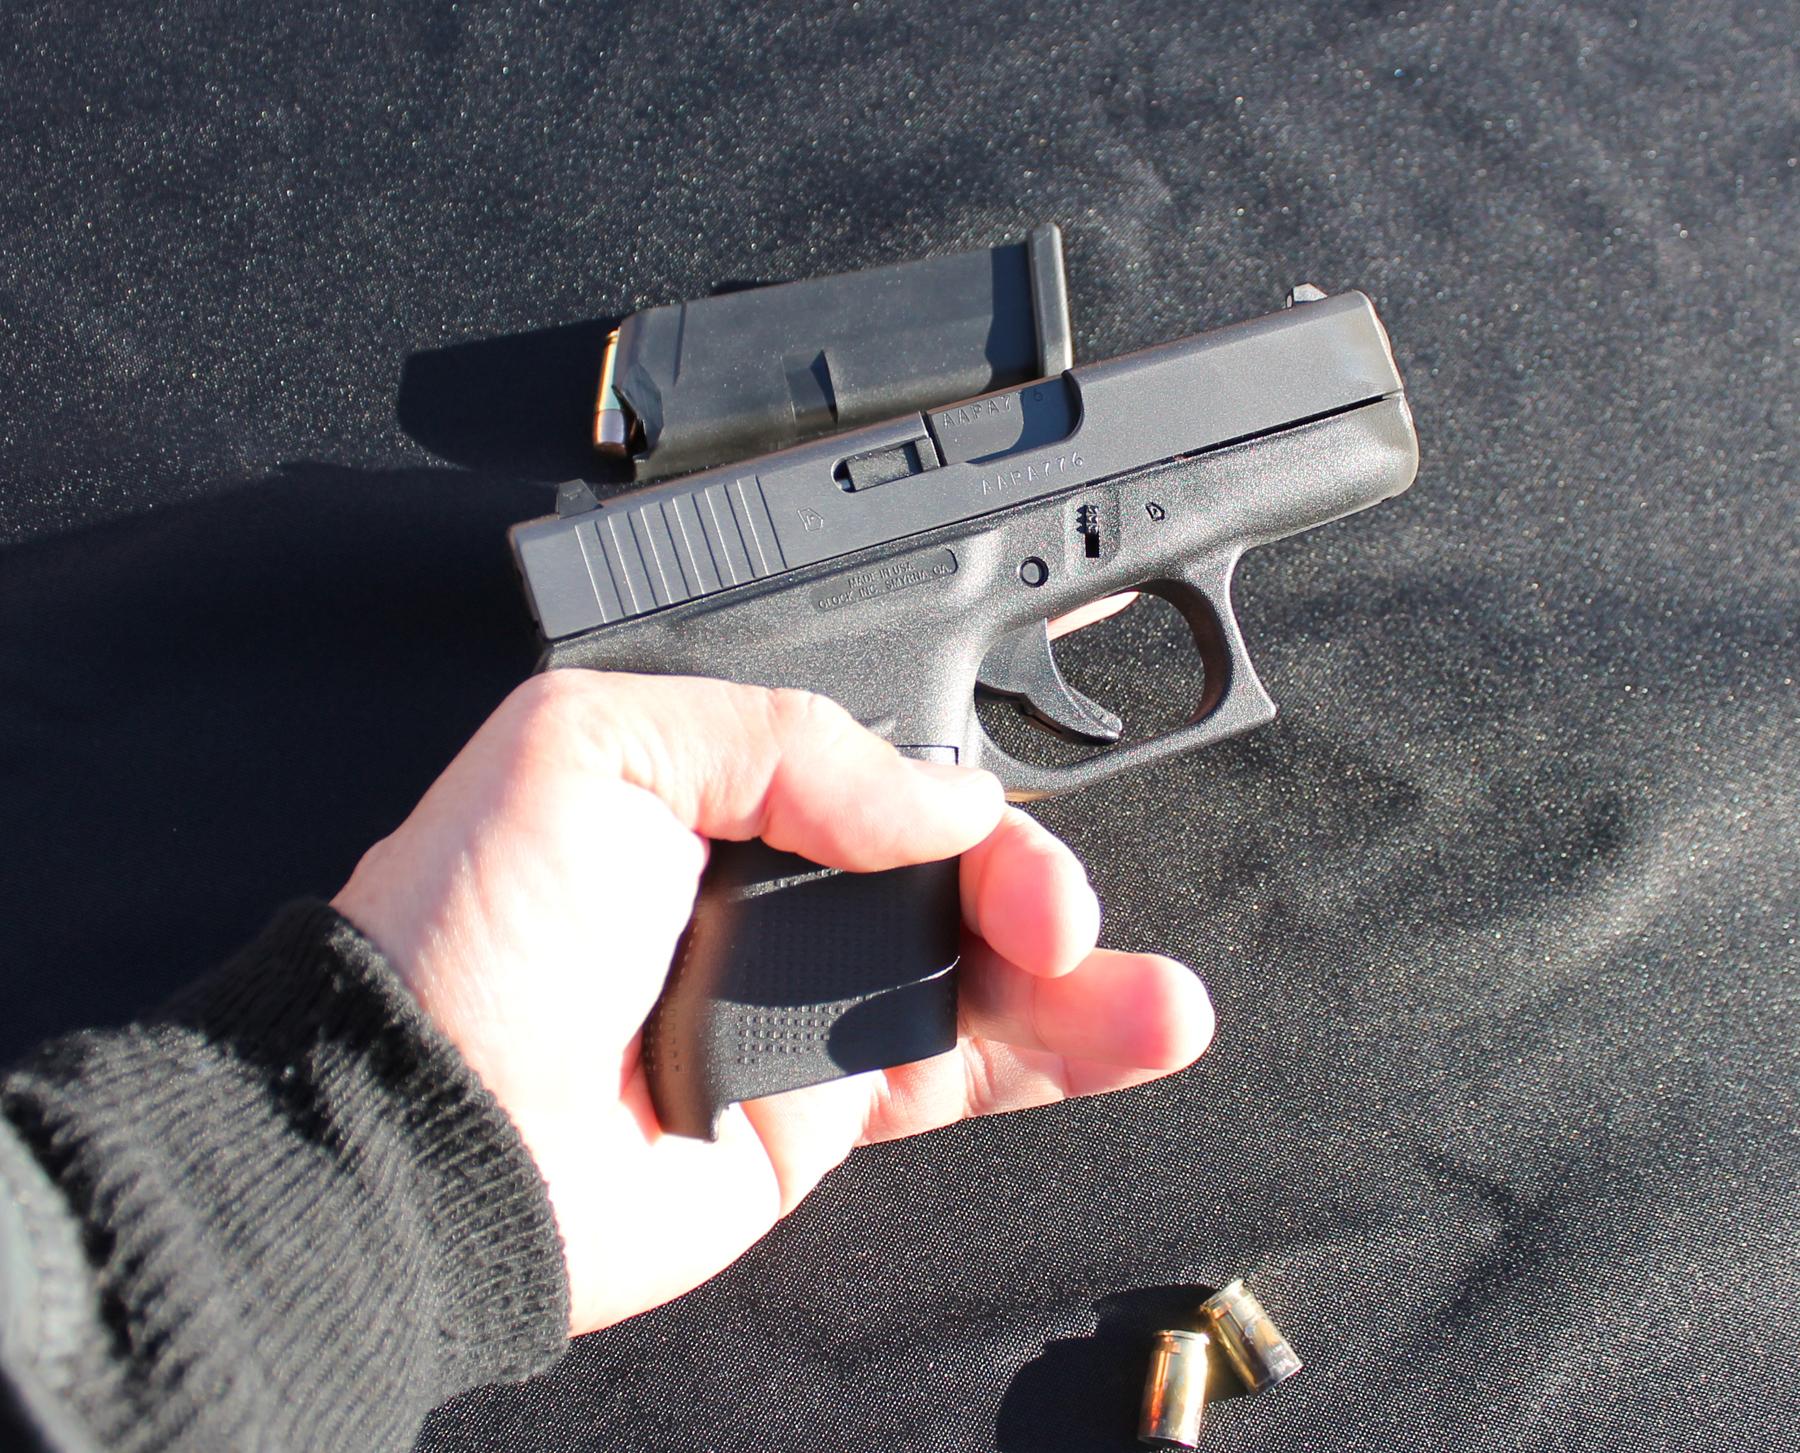 Glock 42 in hand